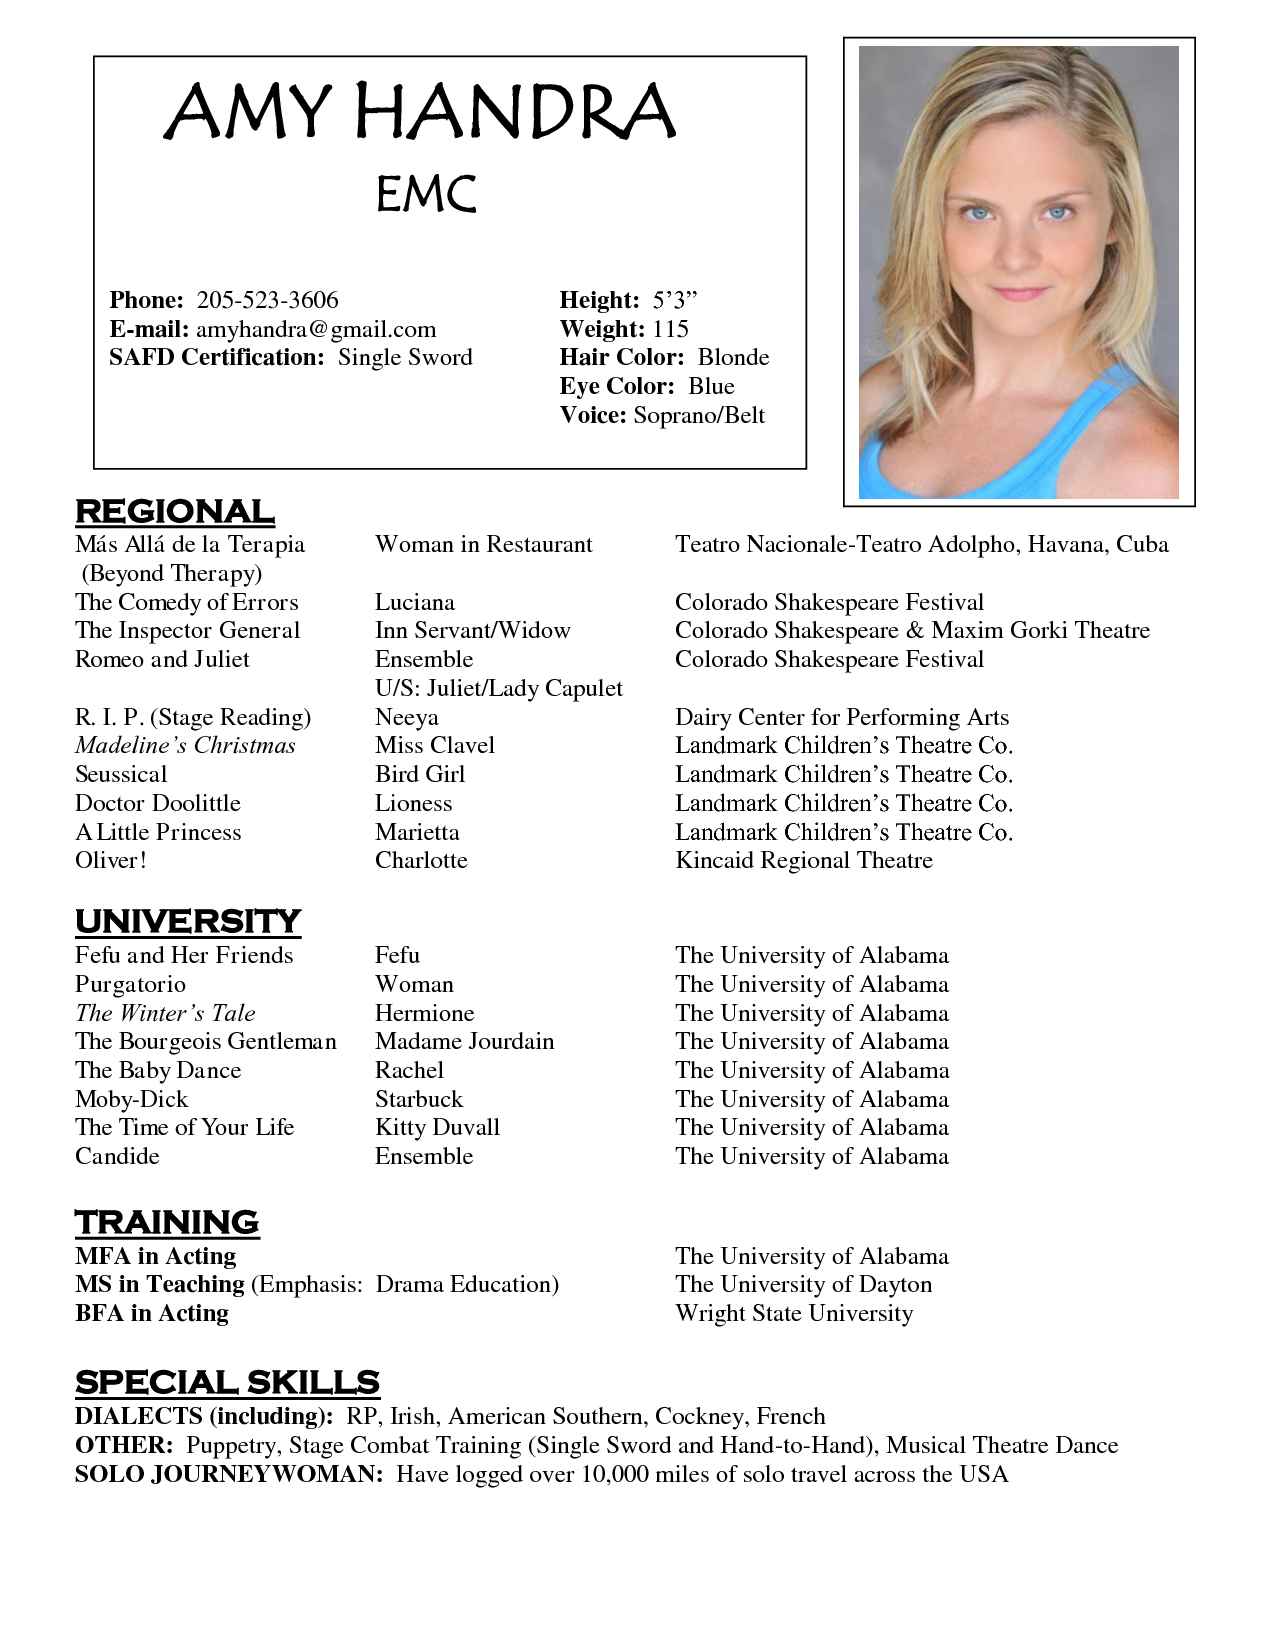 Acting Resume Sample Free Http Www Resumecareer Info Acting Resume Sample Free 25 Acting Resume Acting Resume Template Dance Resume